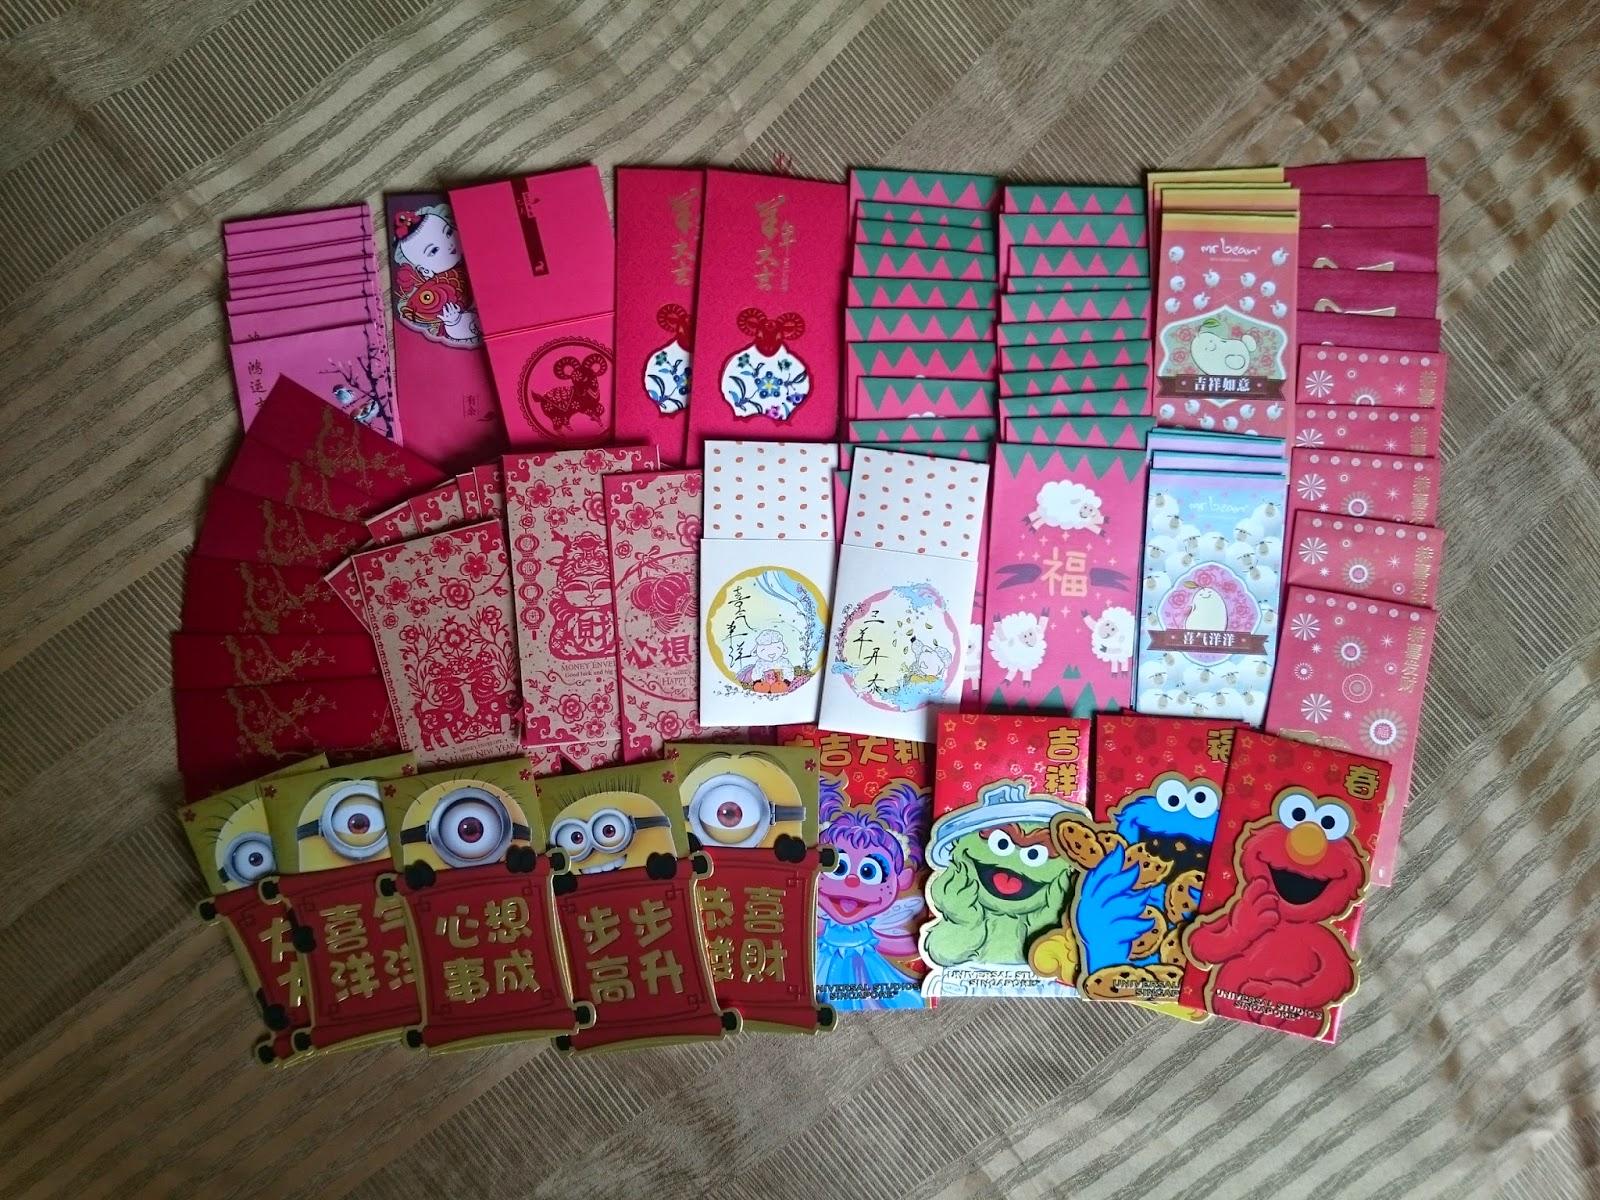 Preparing for Chinese New Year!